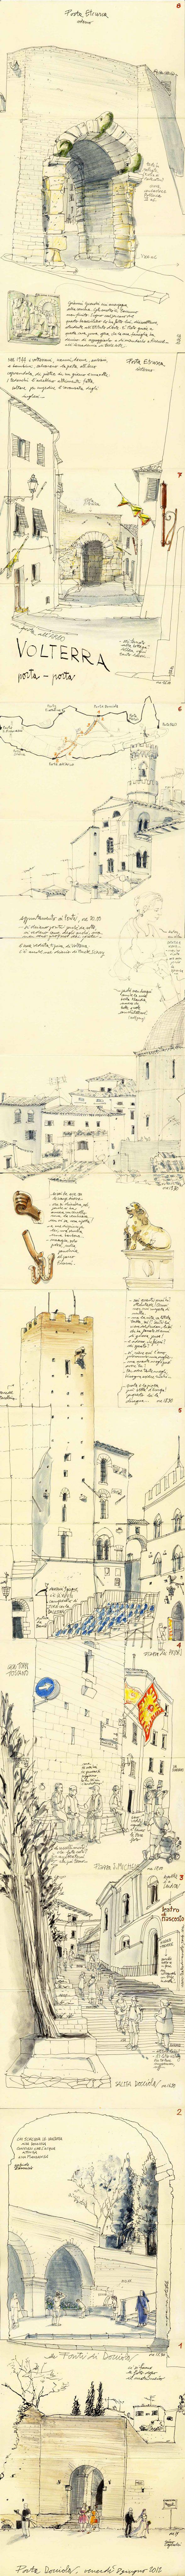 Vertical Volterra Sketchbook